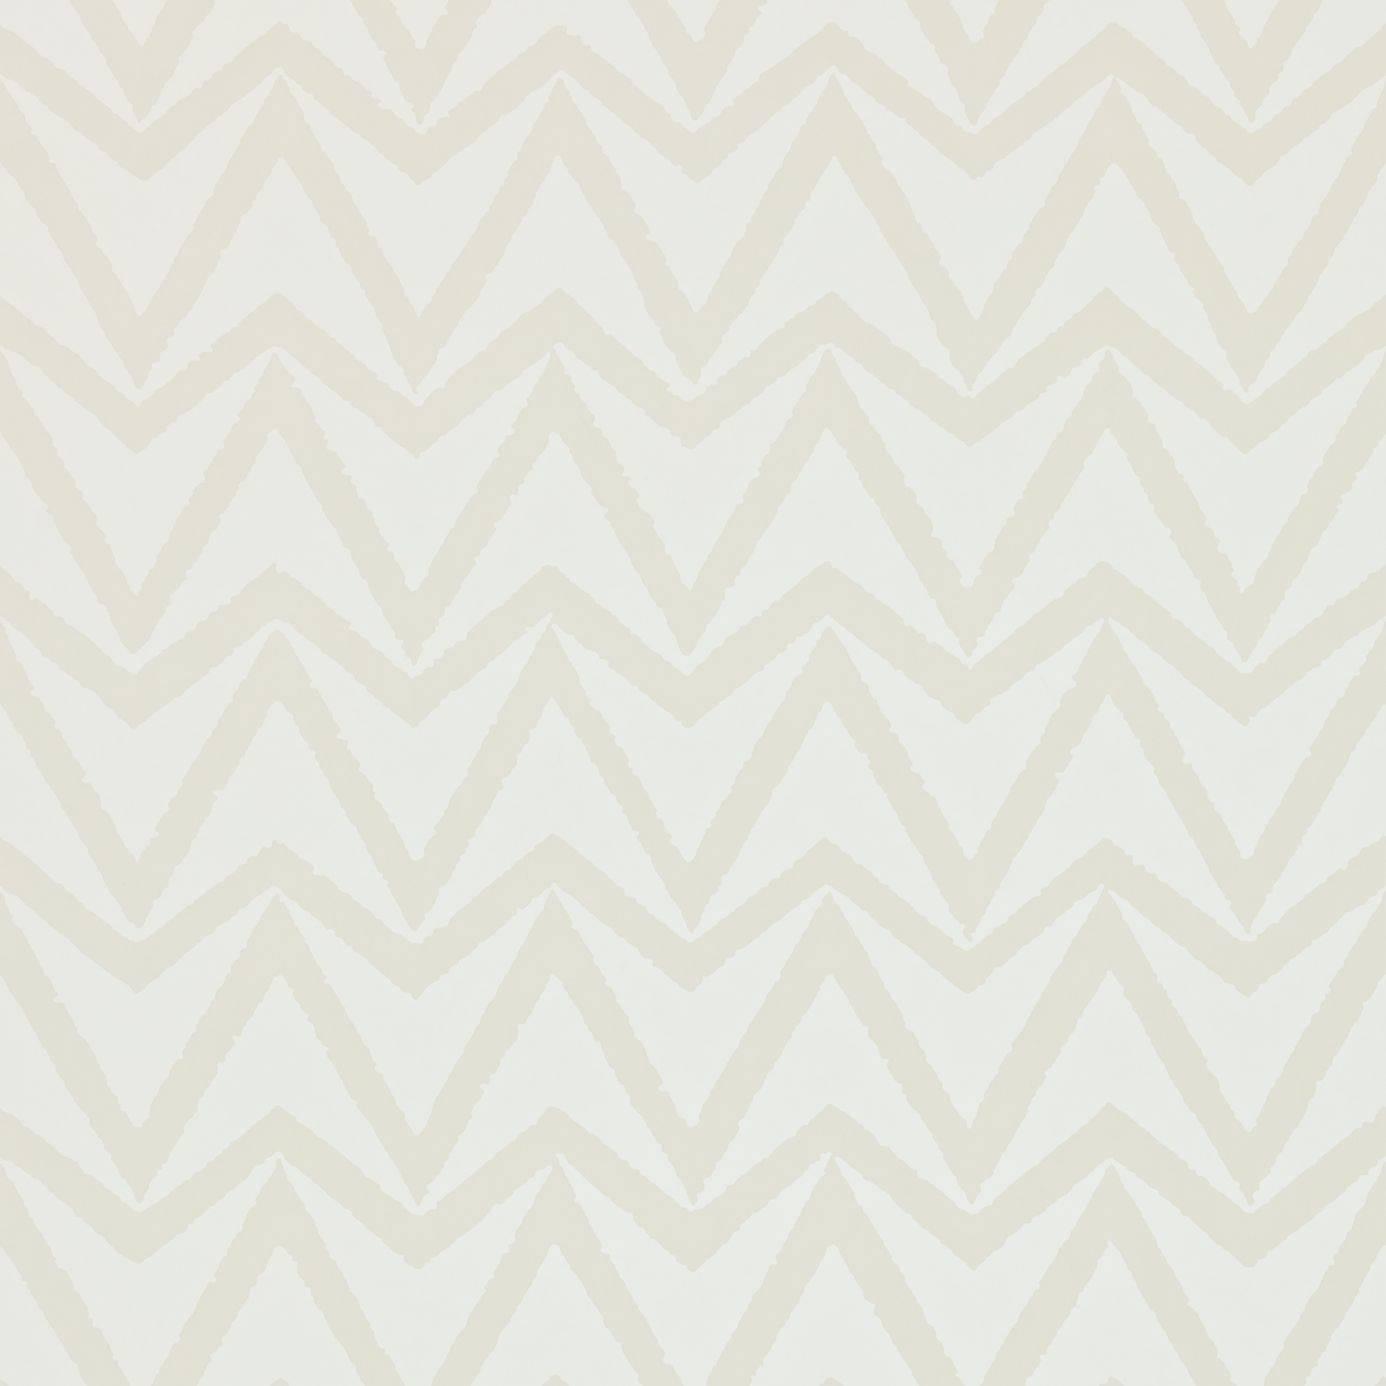 Scion Wabi Sabi Wallpapers Dhurrie Wallpaper - Chalk - 110457. Loading zoom